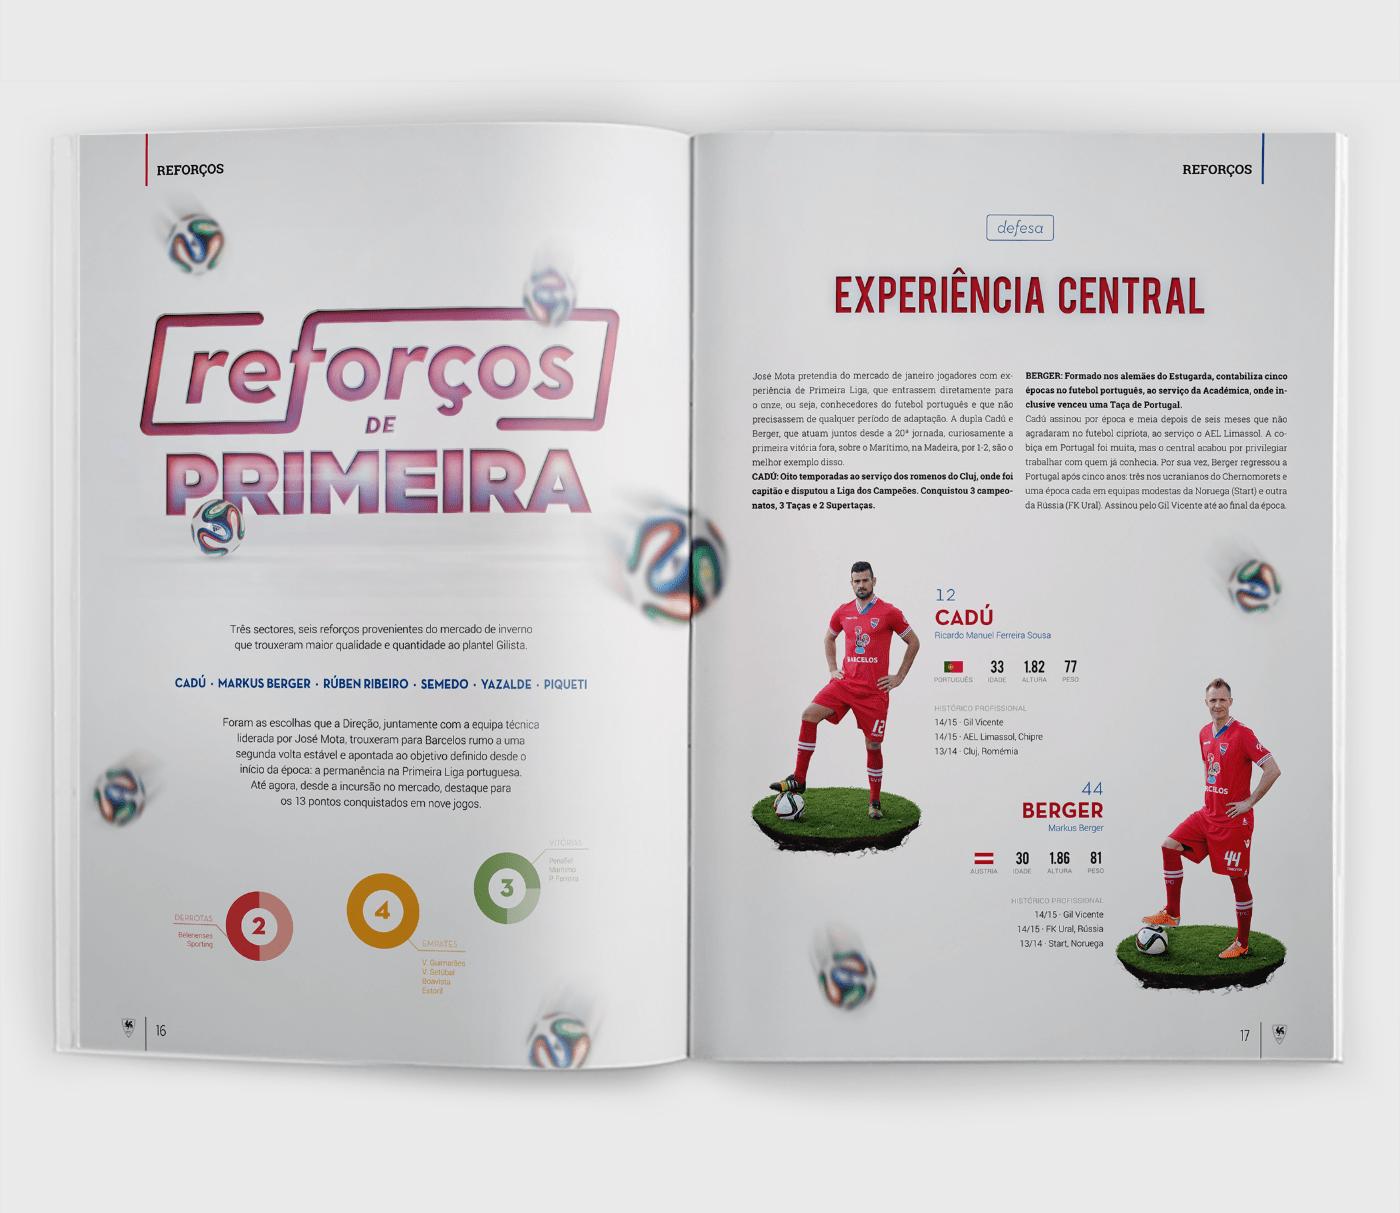 liga nos gil gil vicente gvfc futebol soccer play game Portugal golo estadio